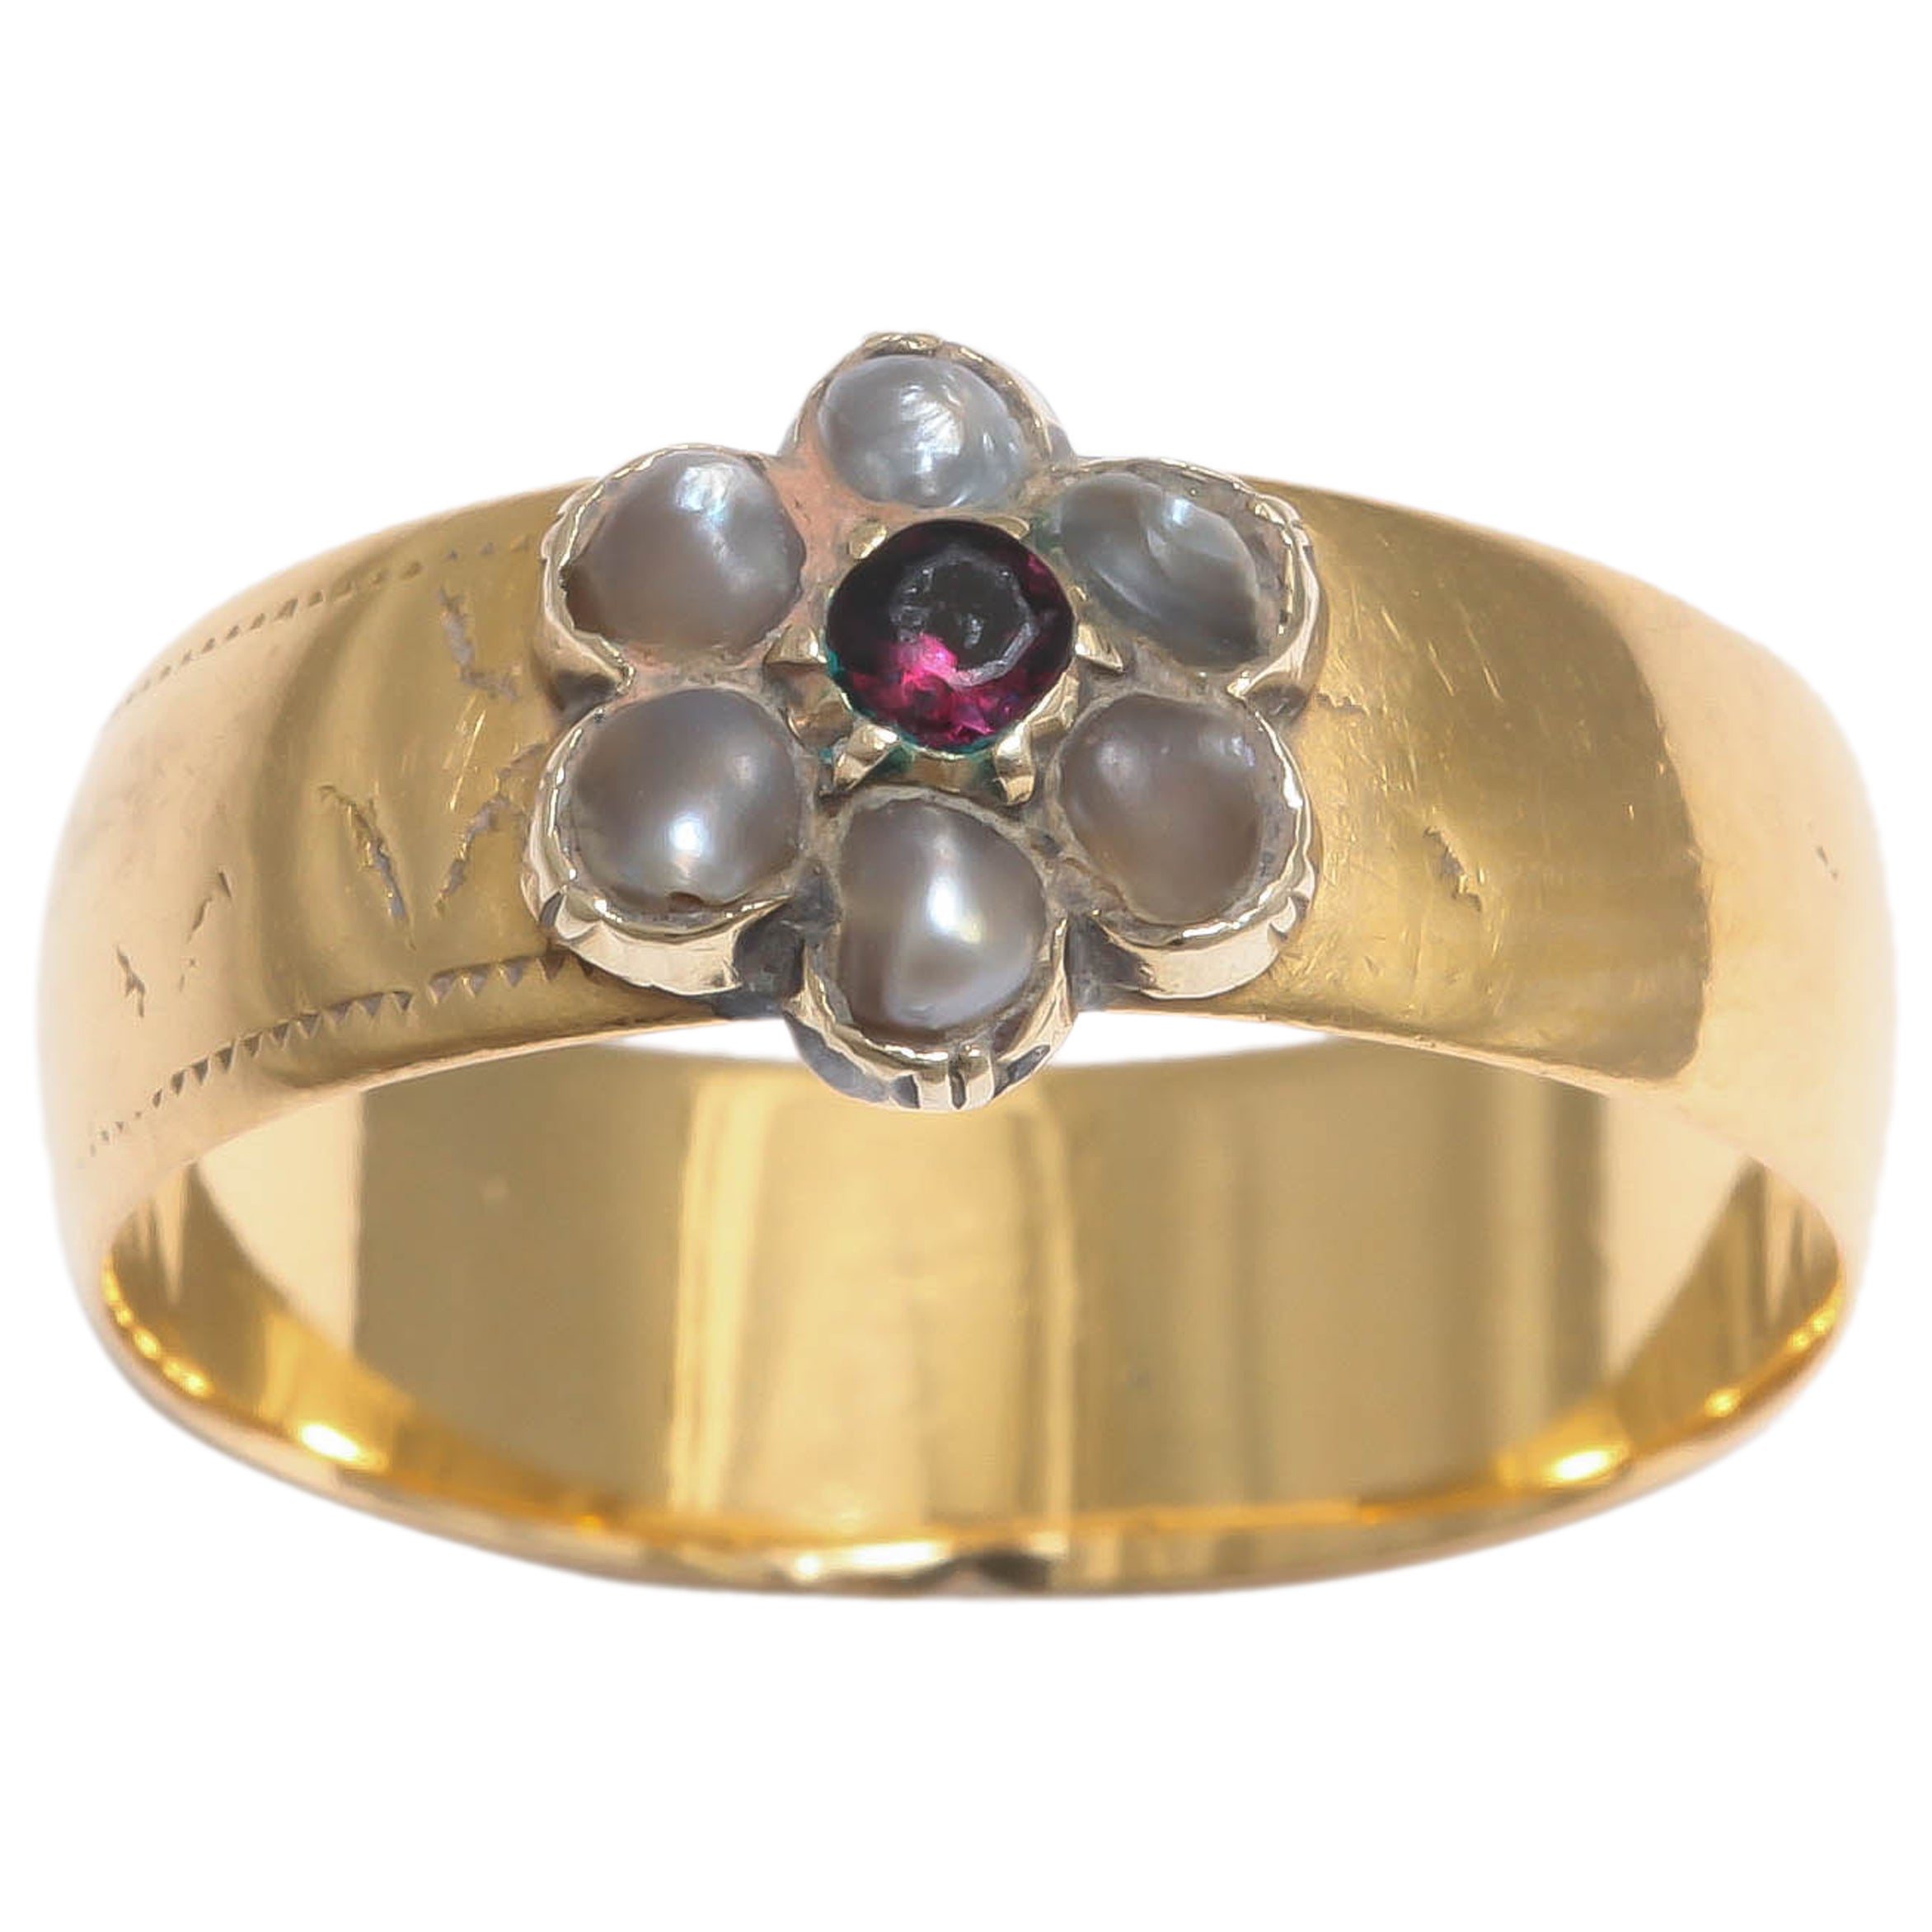 English 19th Century Pearl Gold Daisy Ring, 19th century